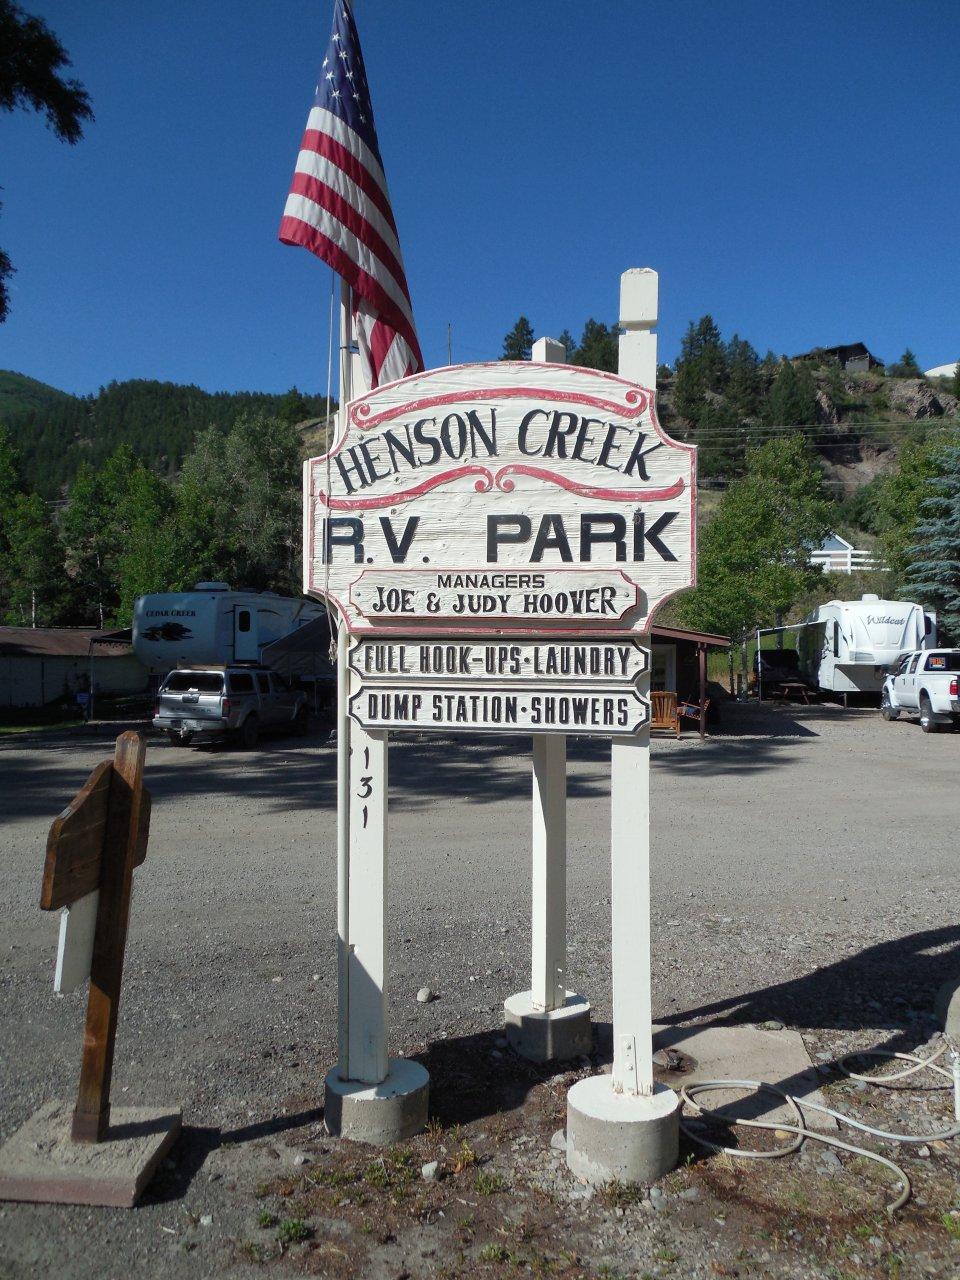 20140809_G_Henson Creek RV.jpg